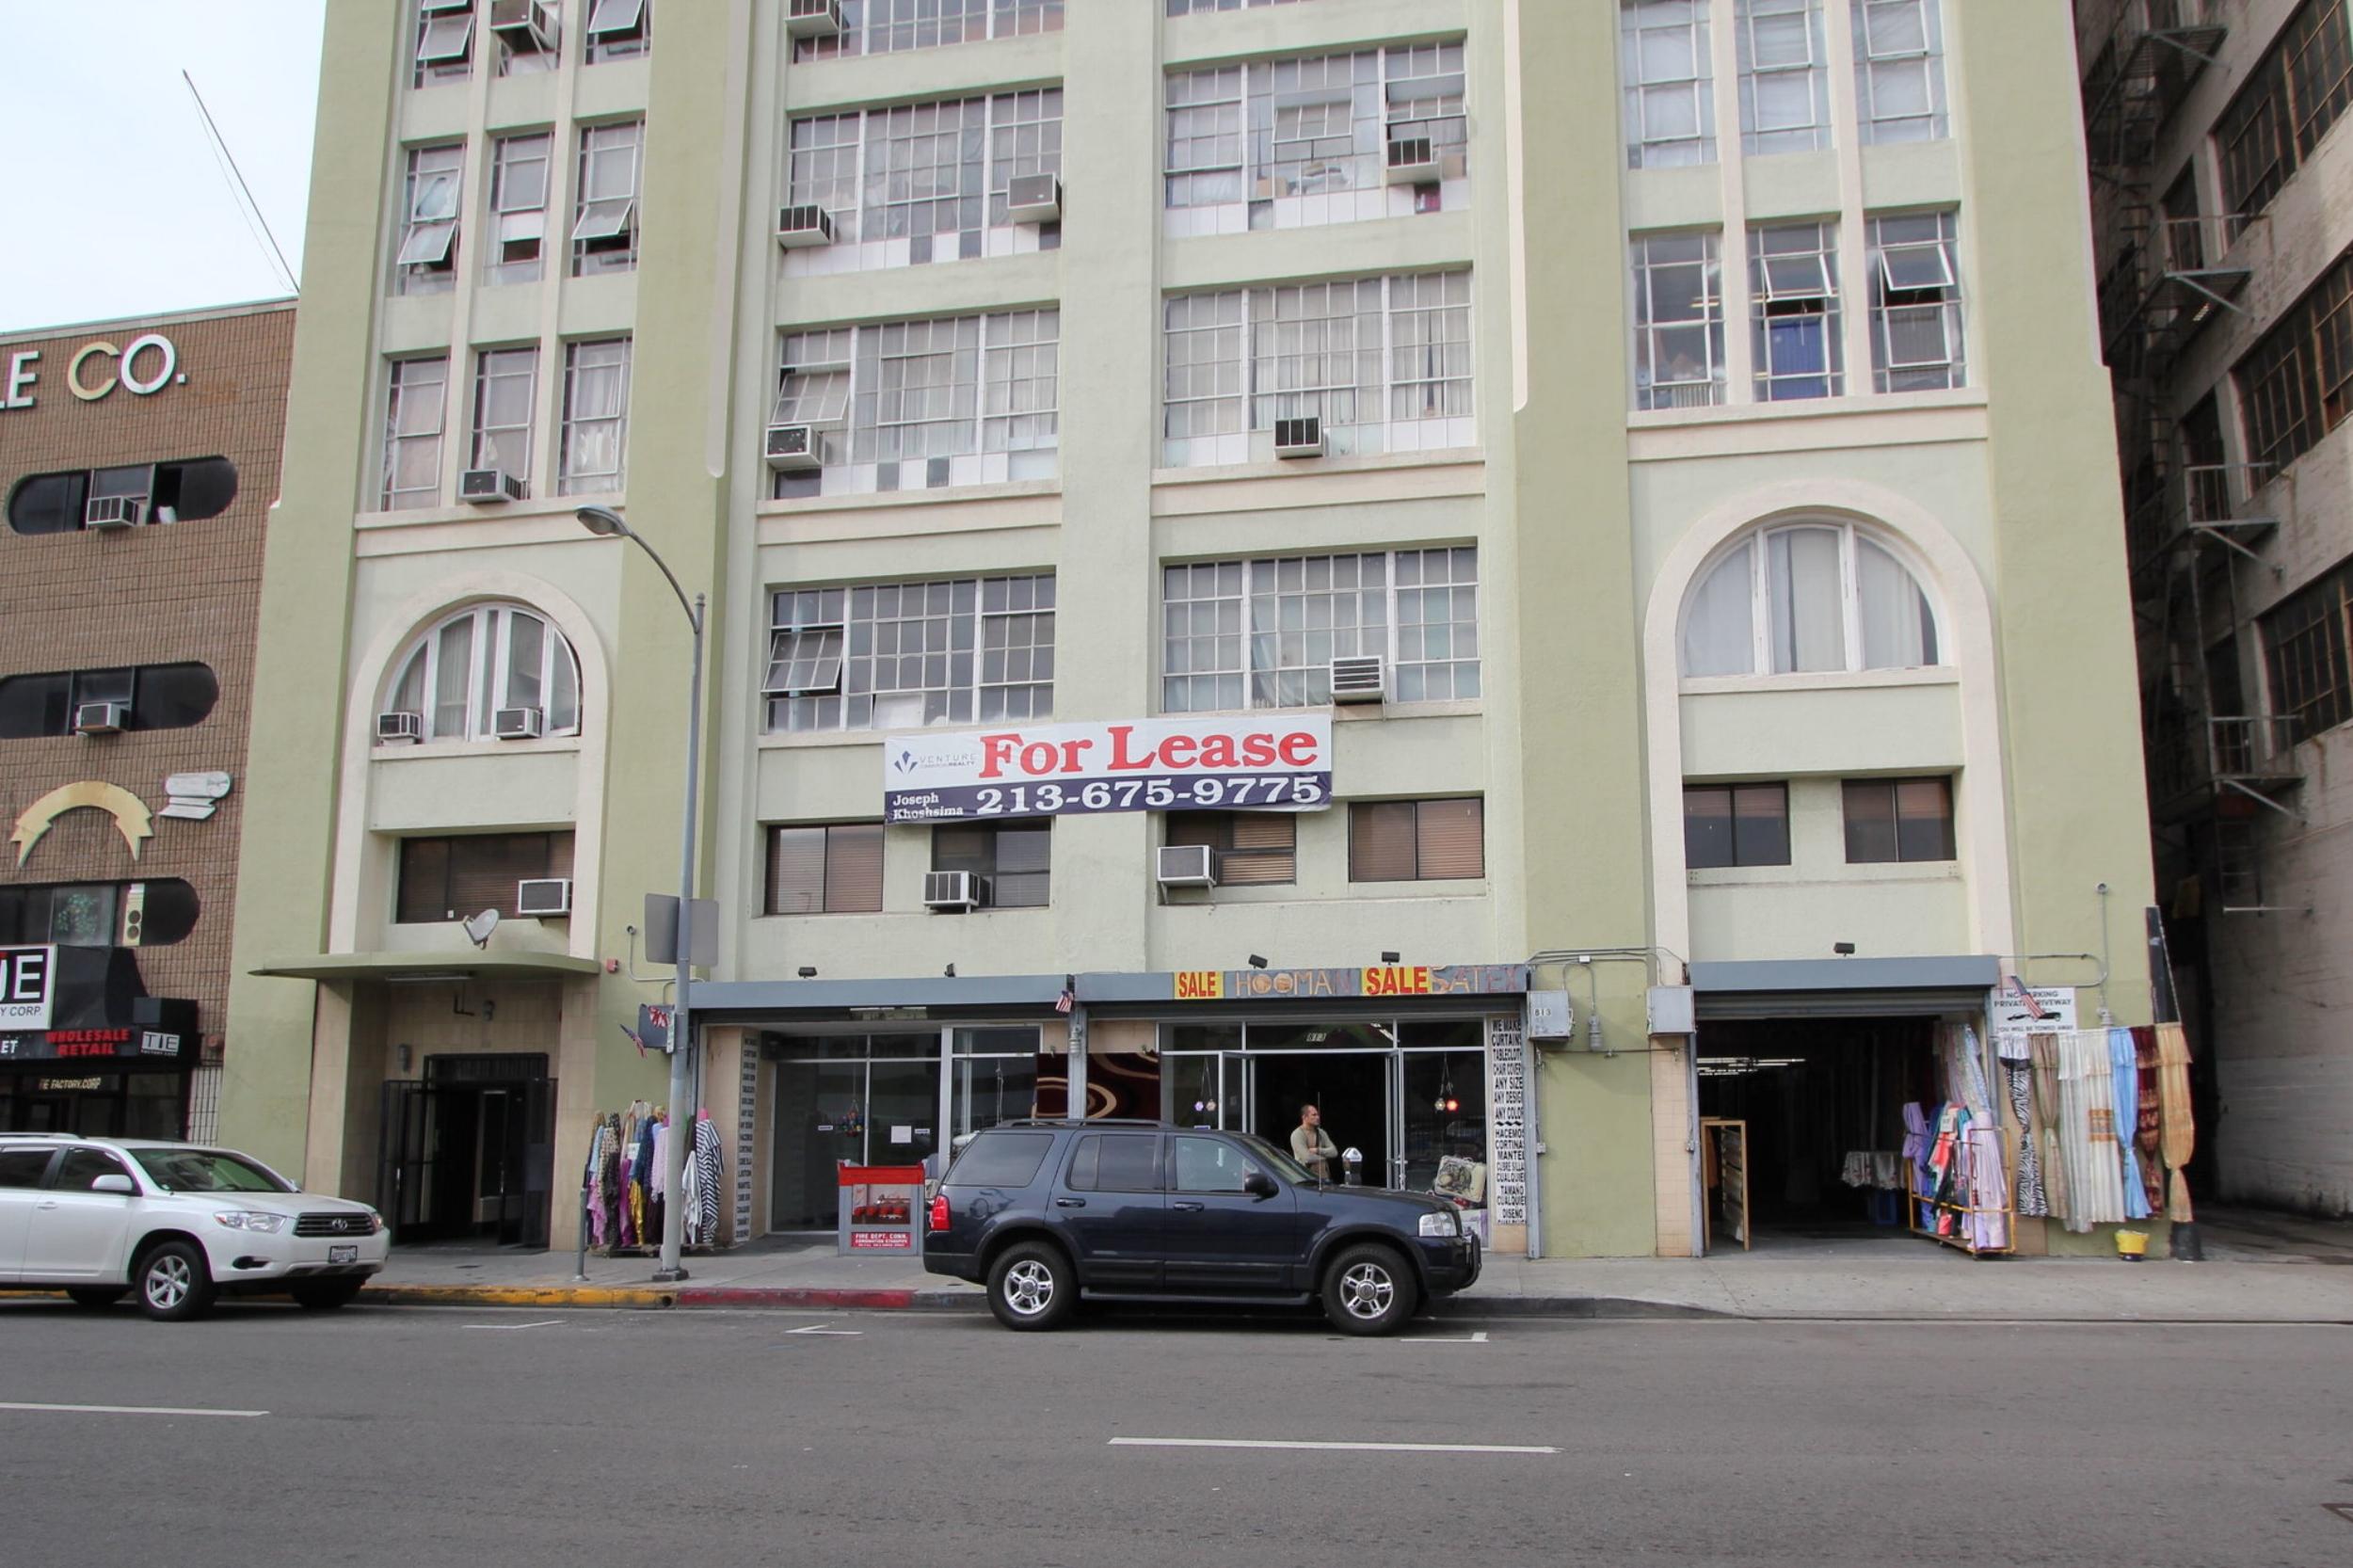 Maxfield Building facade, before rehabilitation.